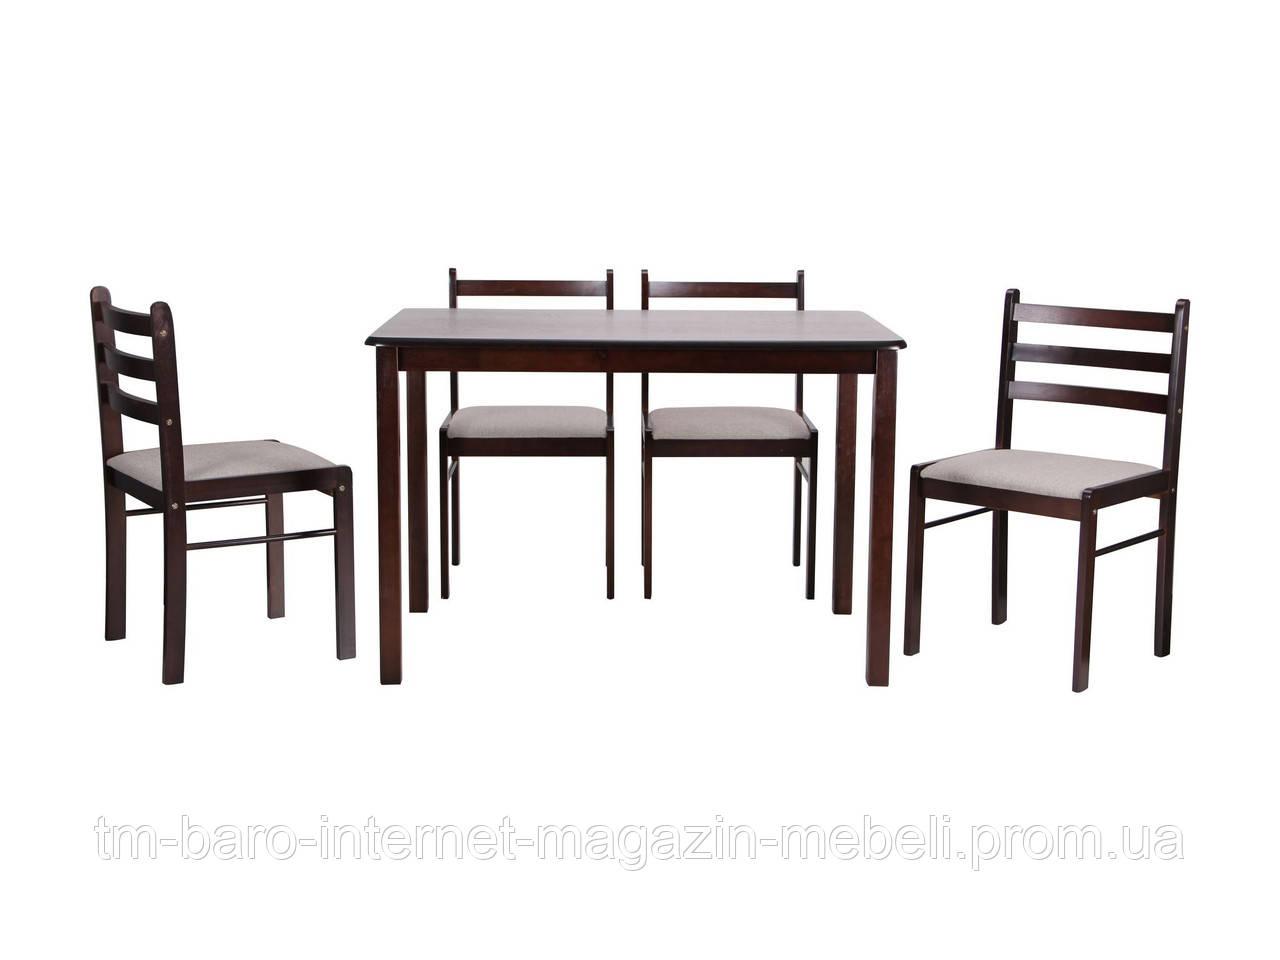 Комплект обеденный Брауни (стол+4 стула) темный шоколад/латте